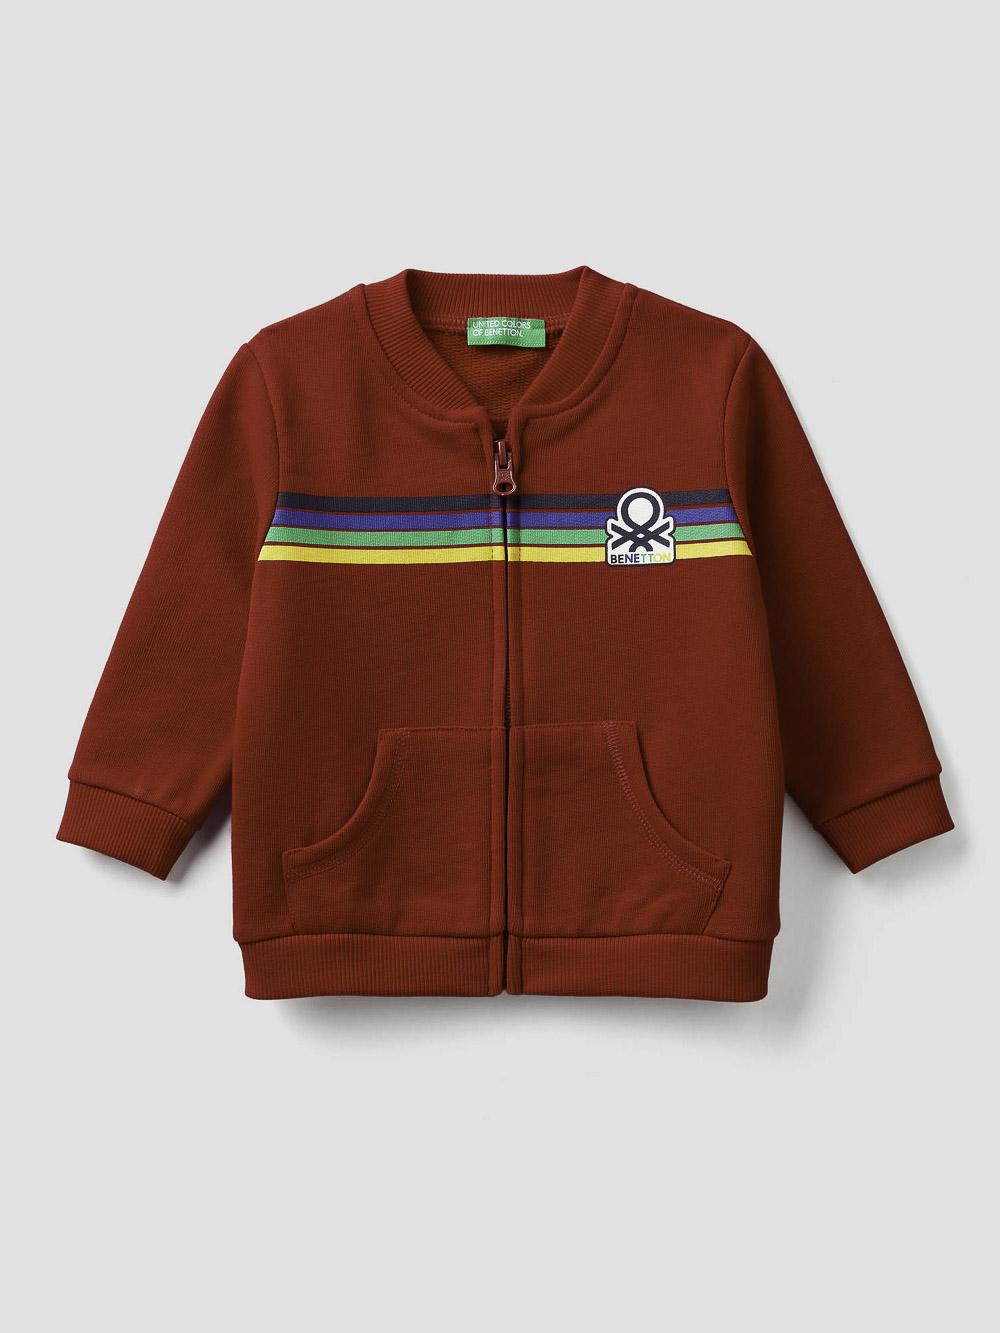 012 BENETTON Ζακέτα φούτερ με φερμουάρ και λογότυπο 3J70C5836 20A015